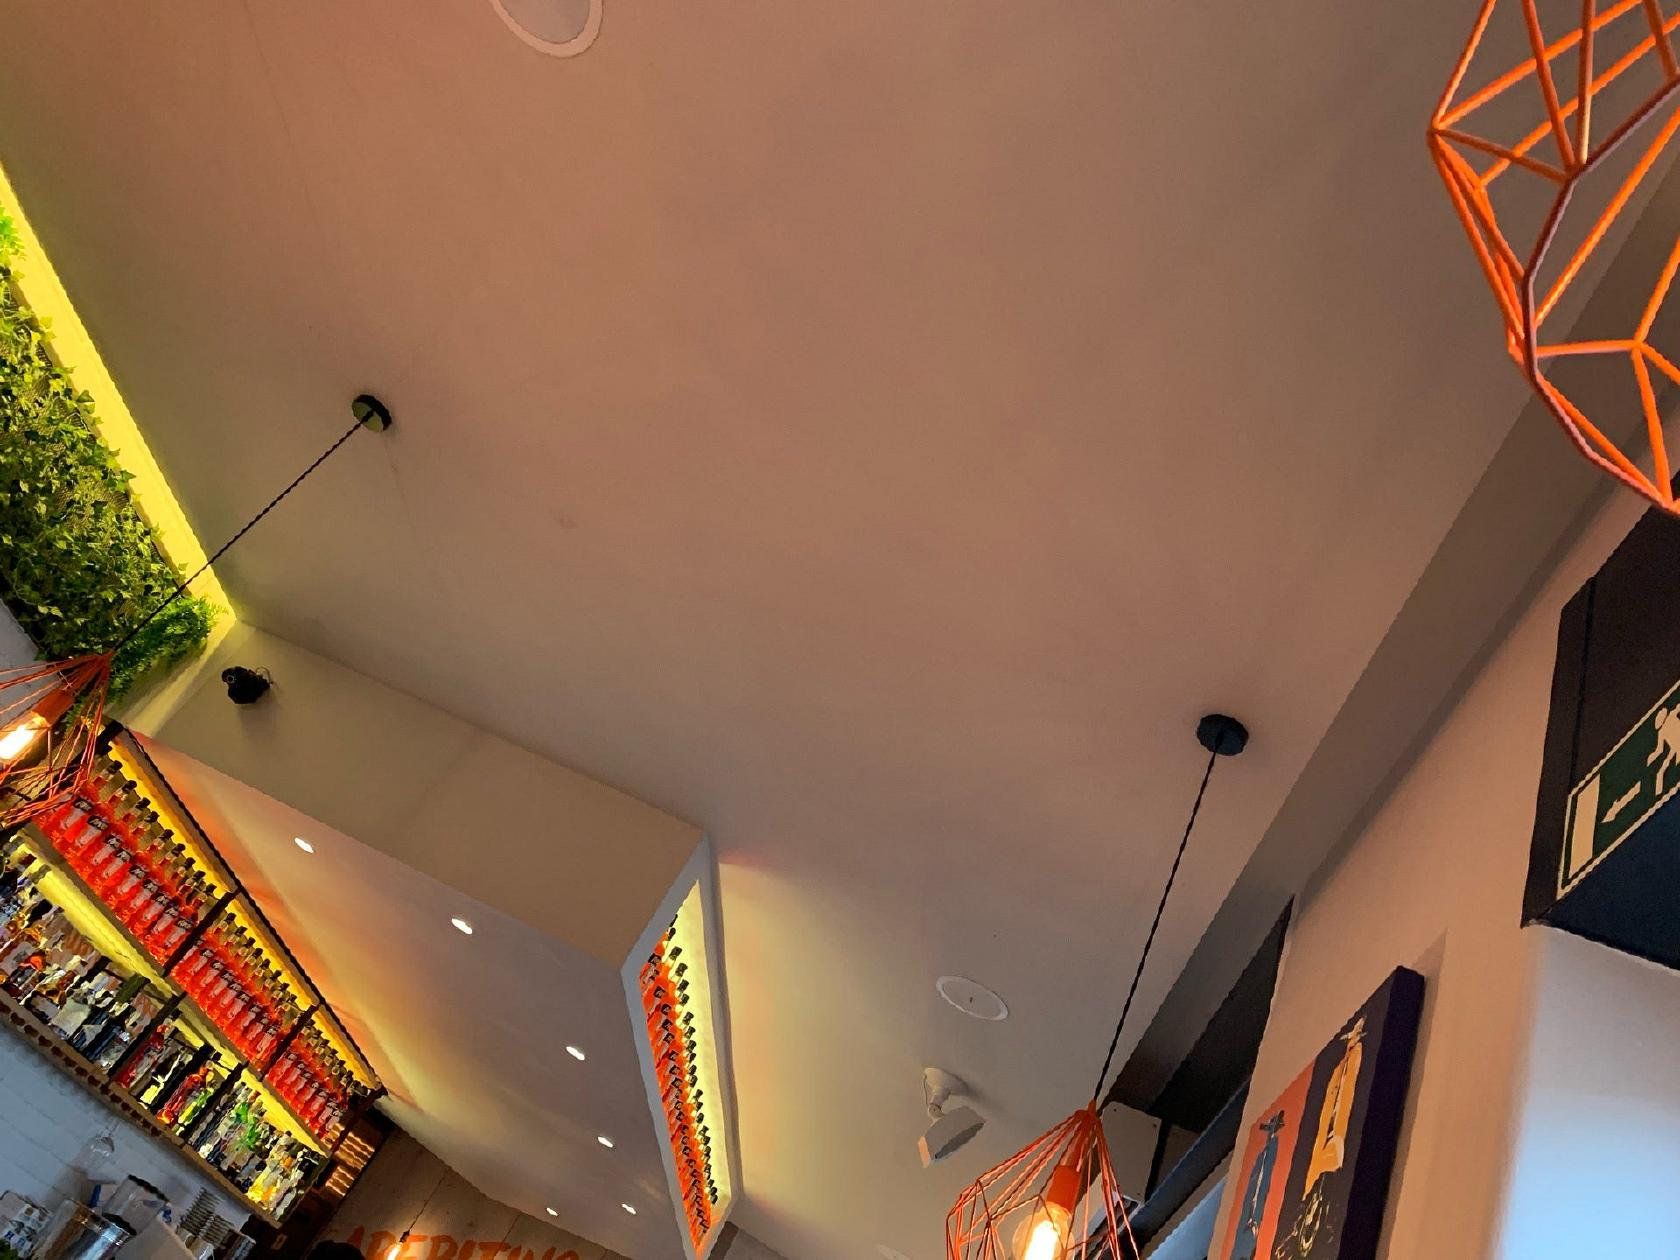 паб и бар Terrazza Aperol Spritz барселона меню и отзывы